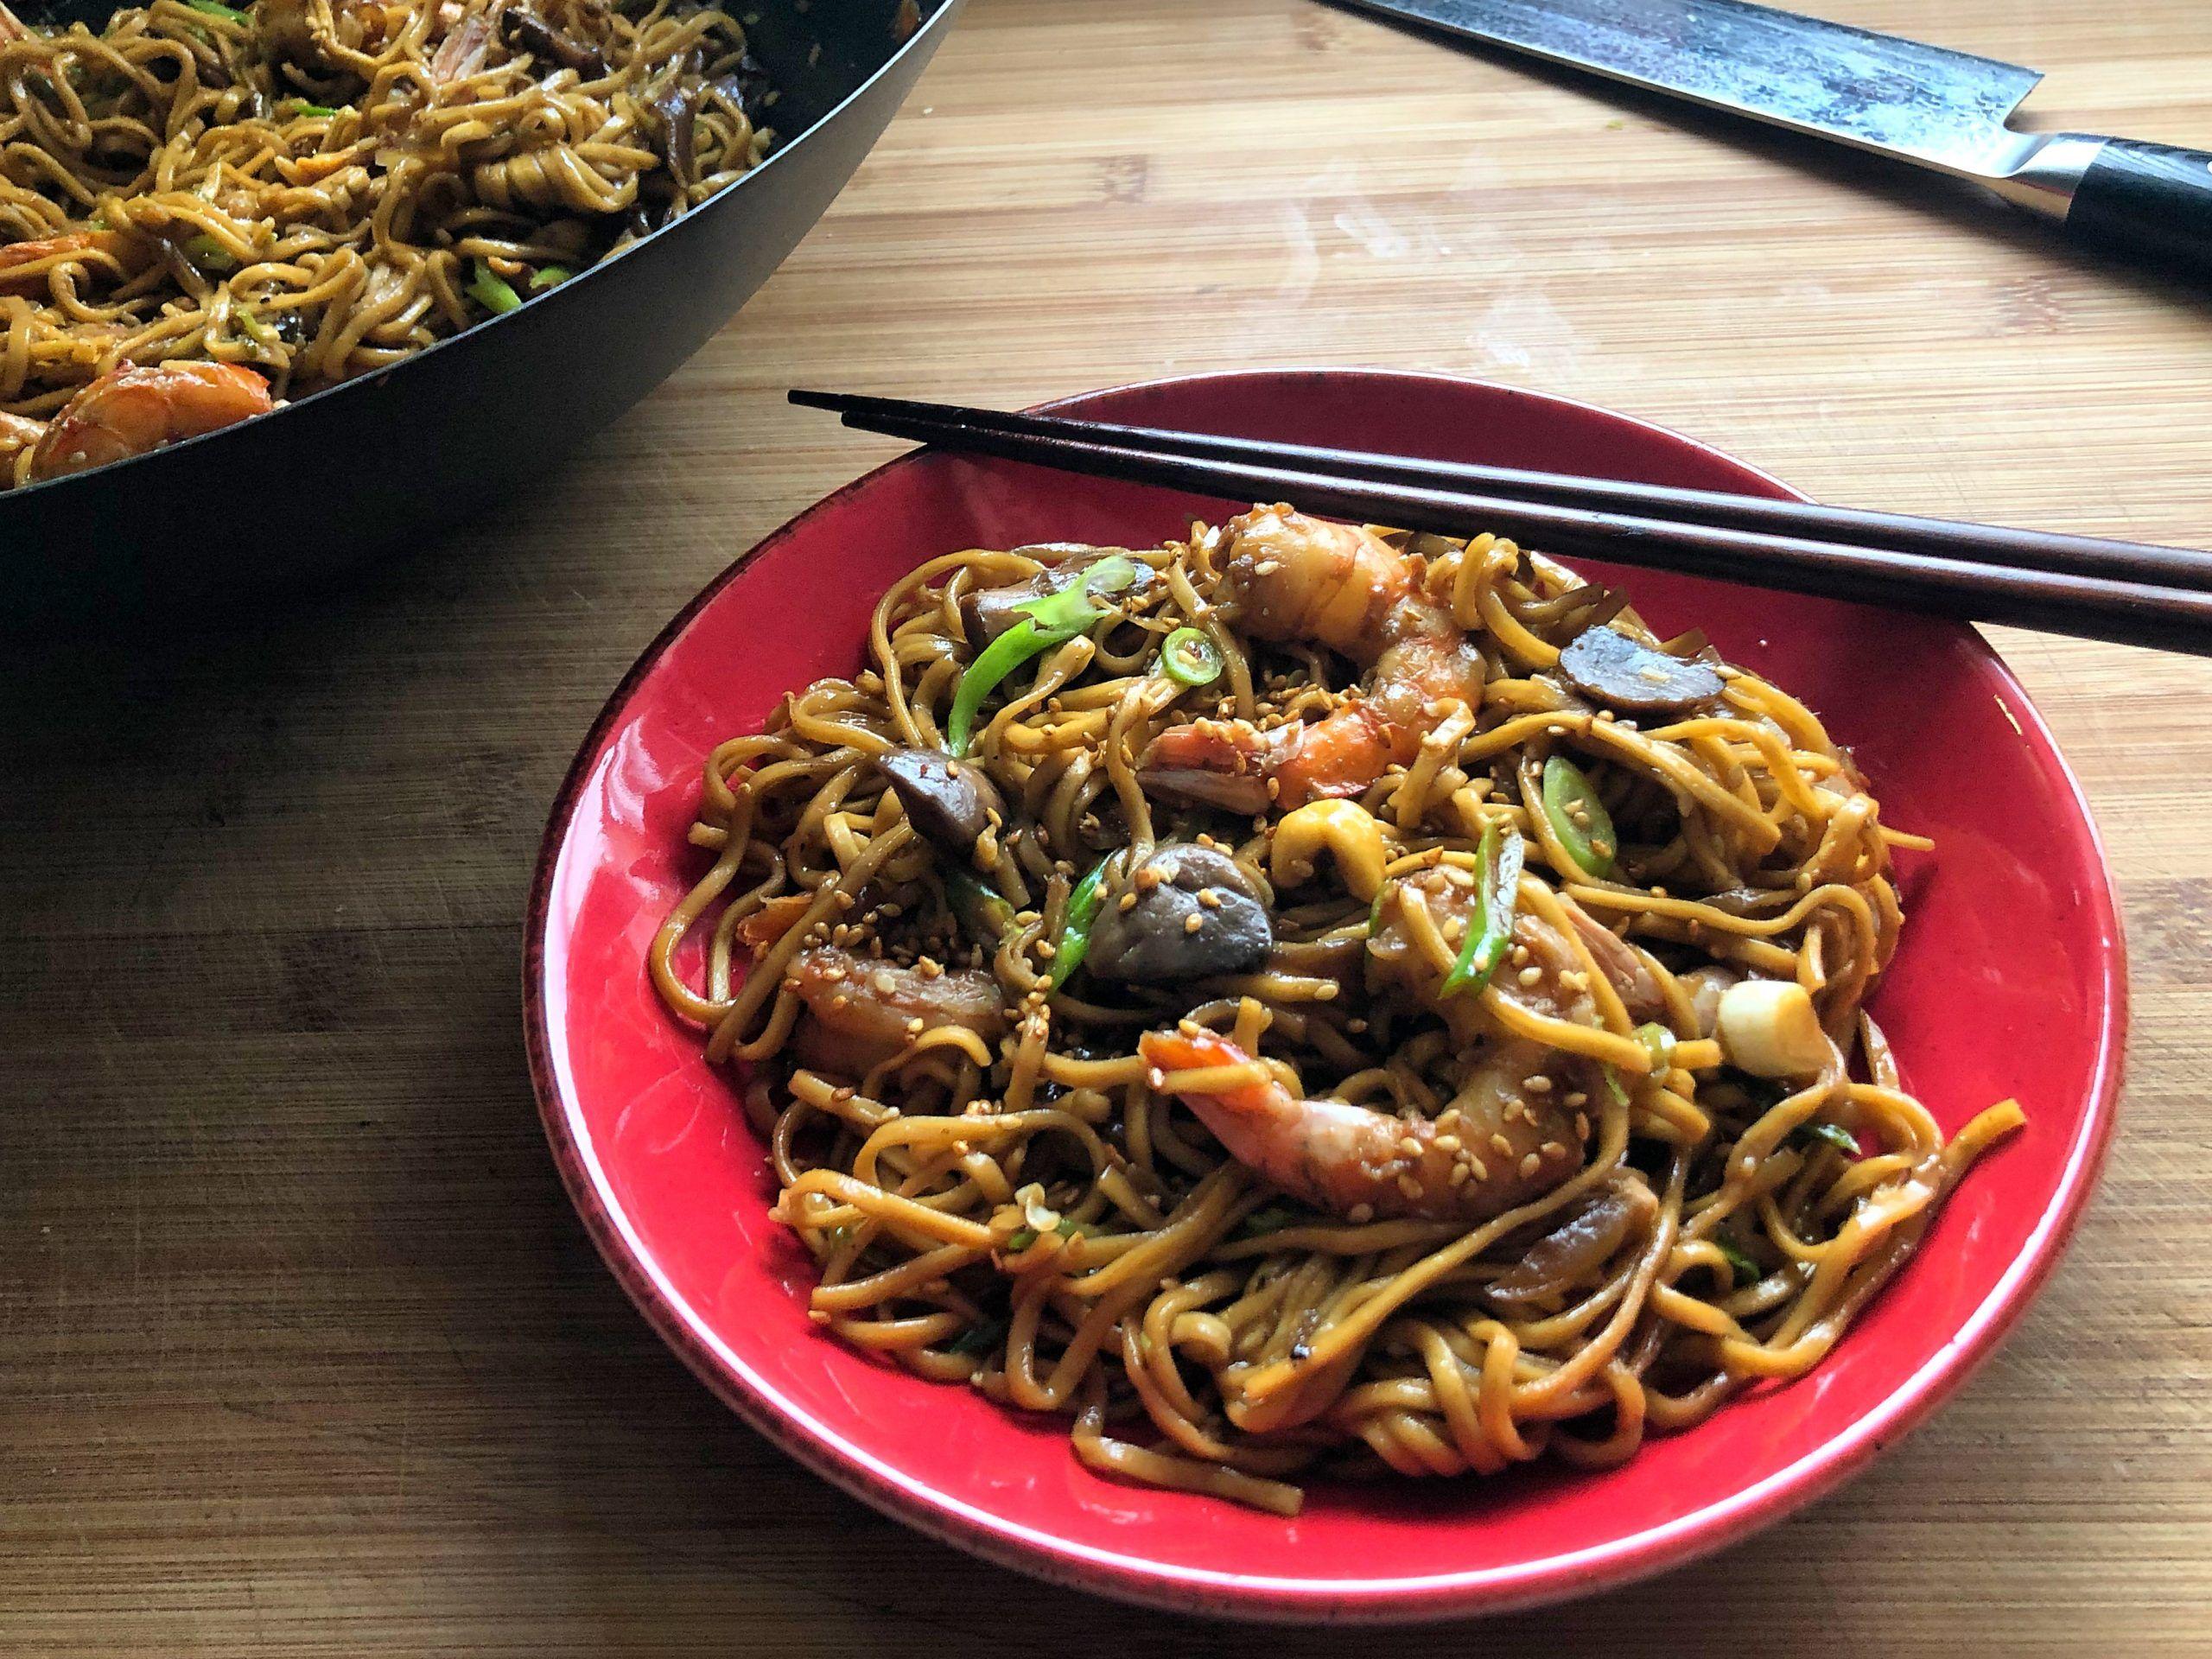 Noodles με Γαρίδες, Λαχανικά και Σάλτσα Τεριγιάκι με Μελάσα